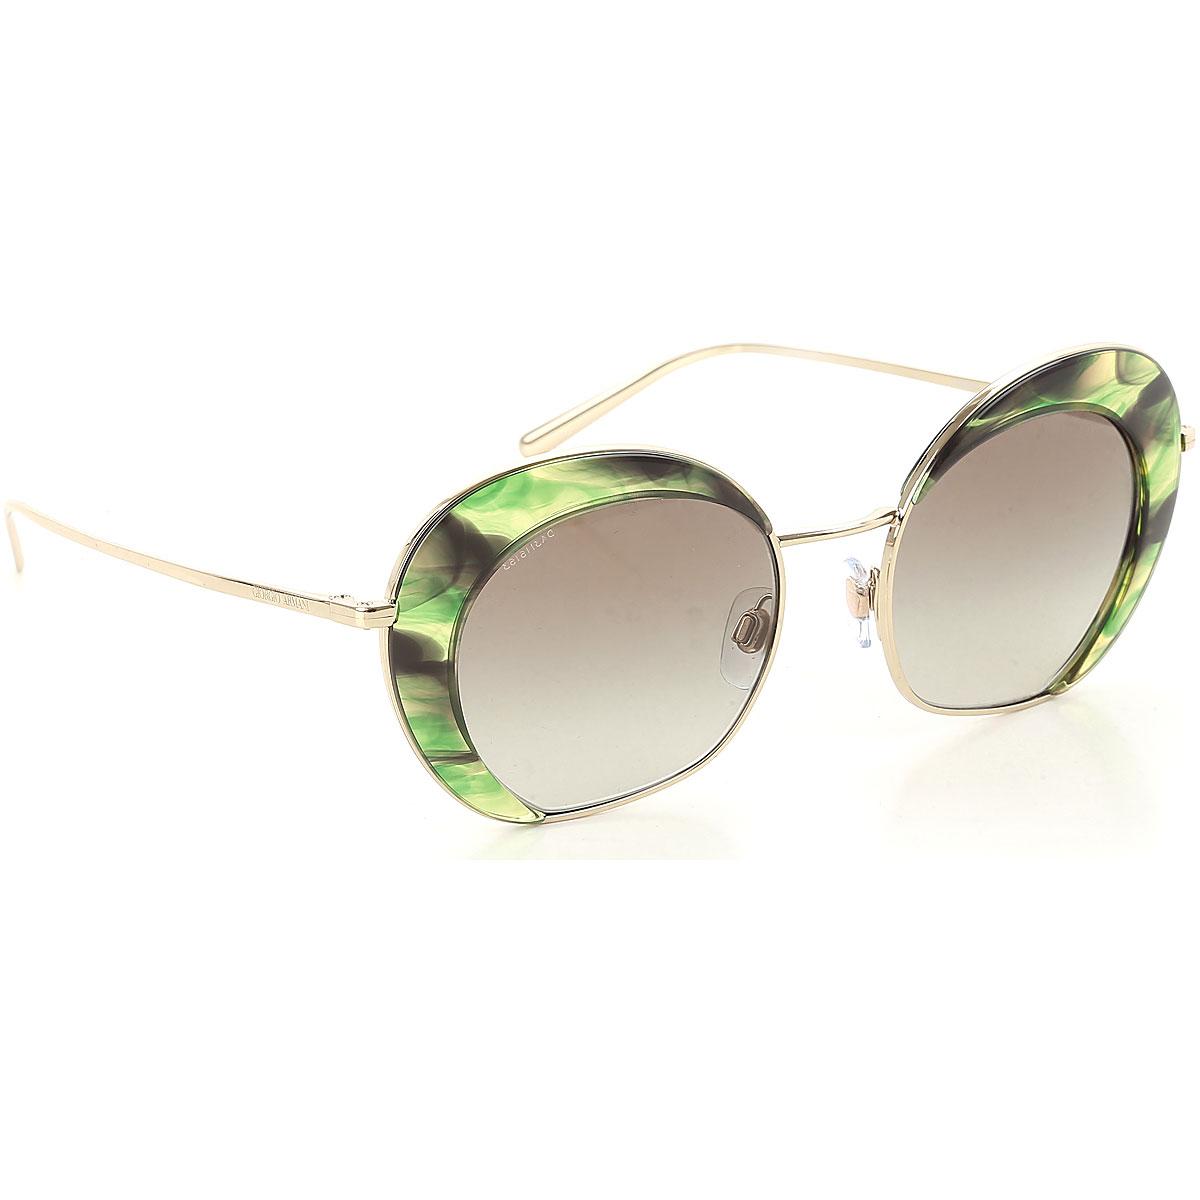 Giorgio Armani Sunglasses On Sale, g, 2019